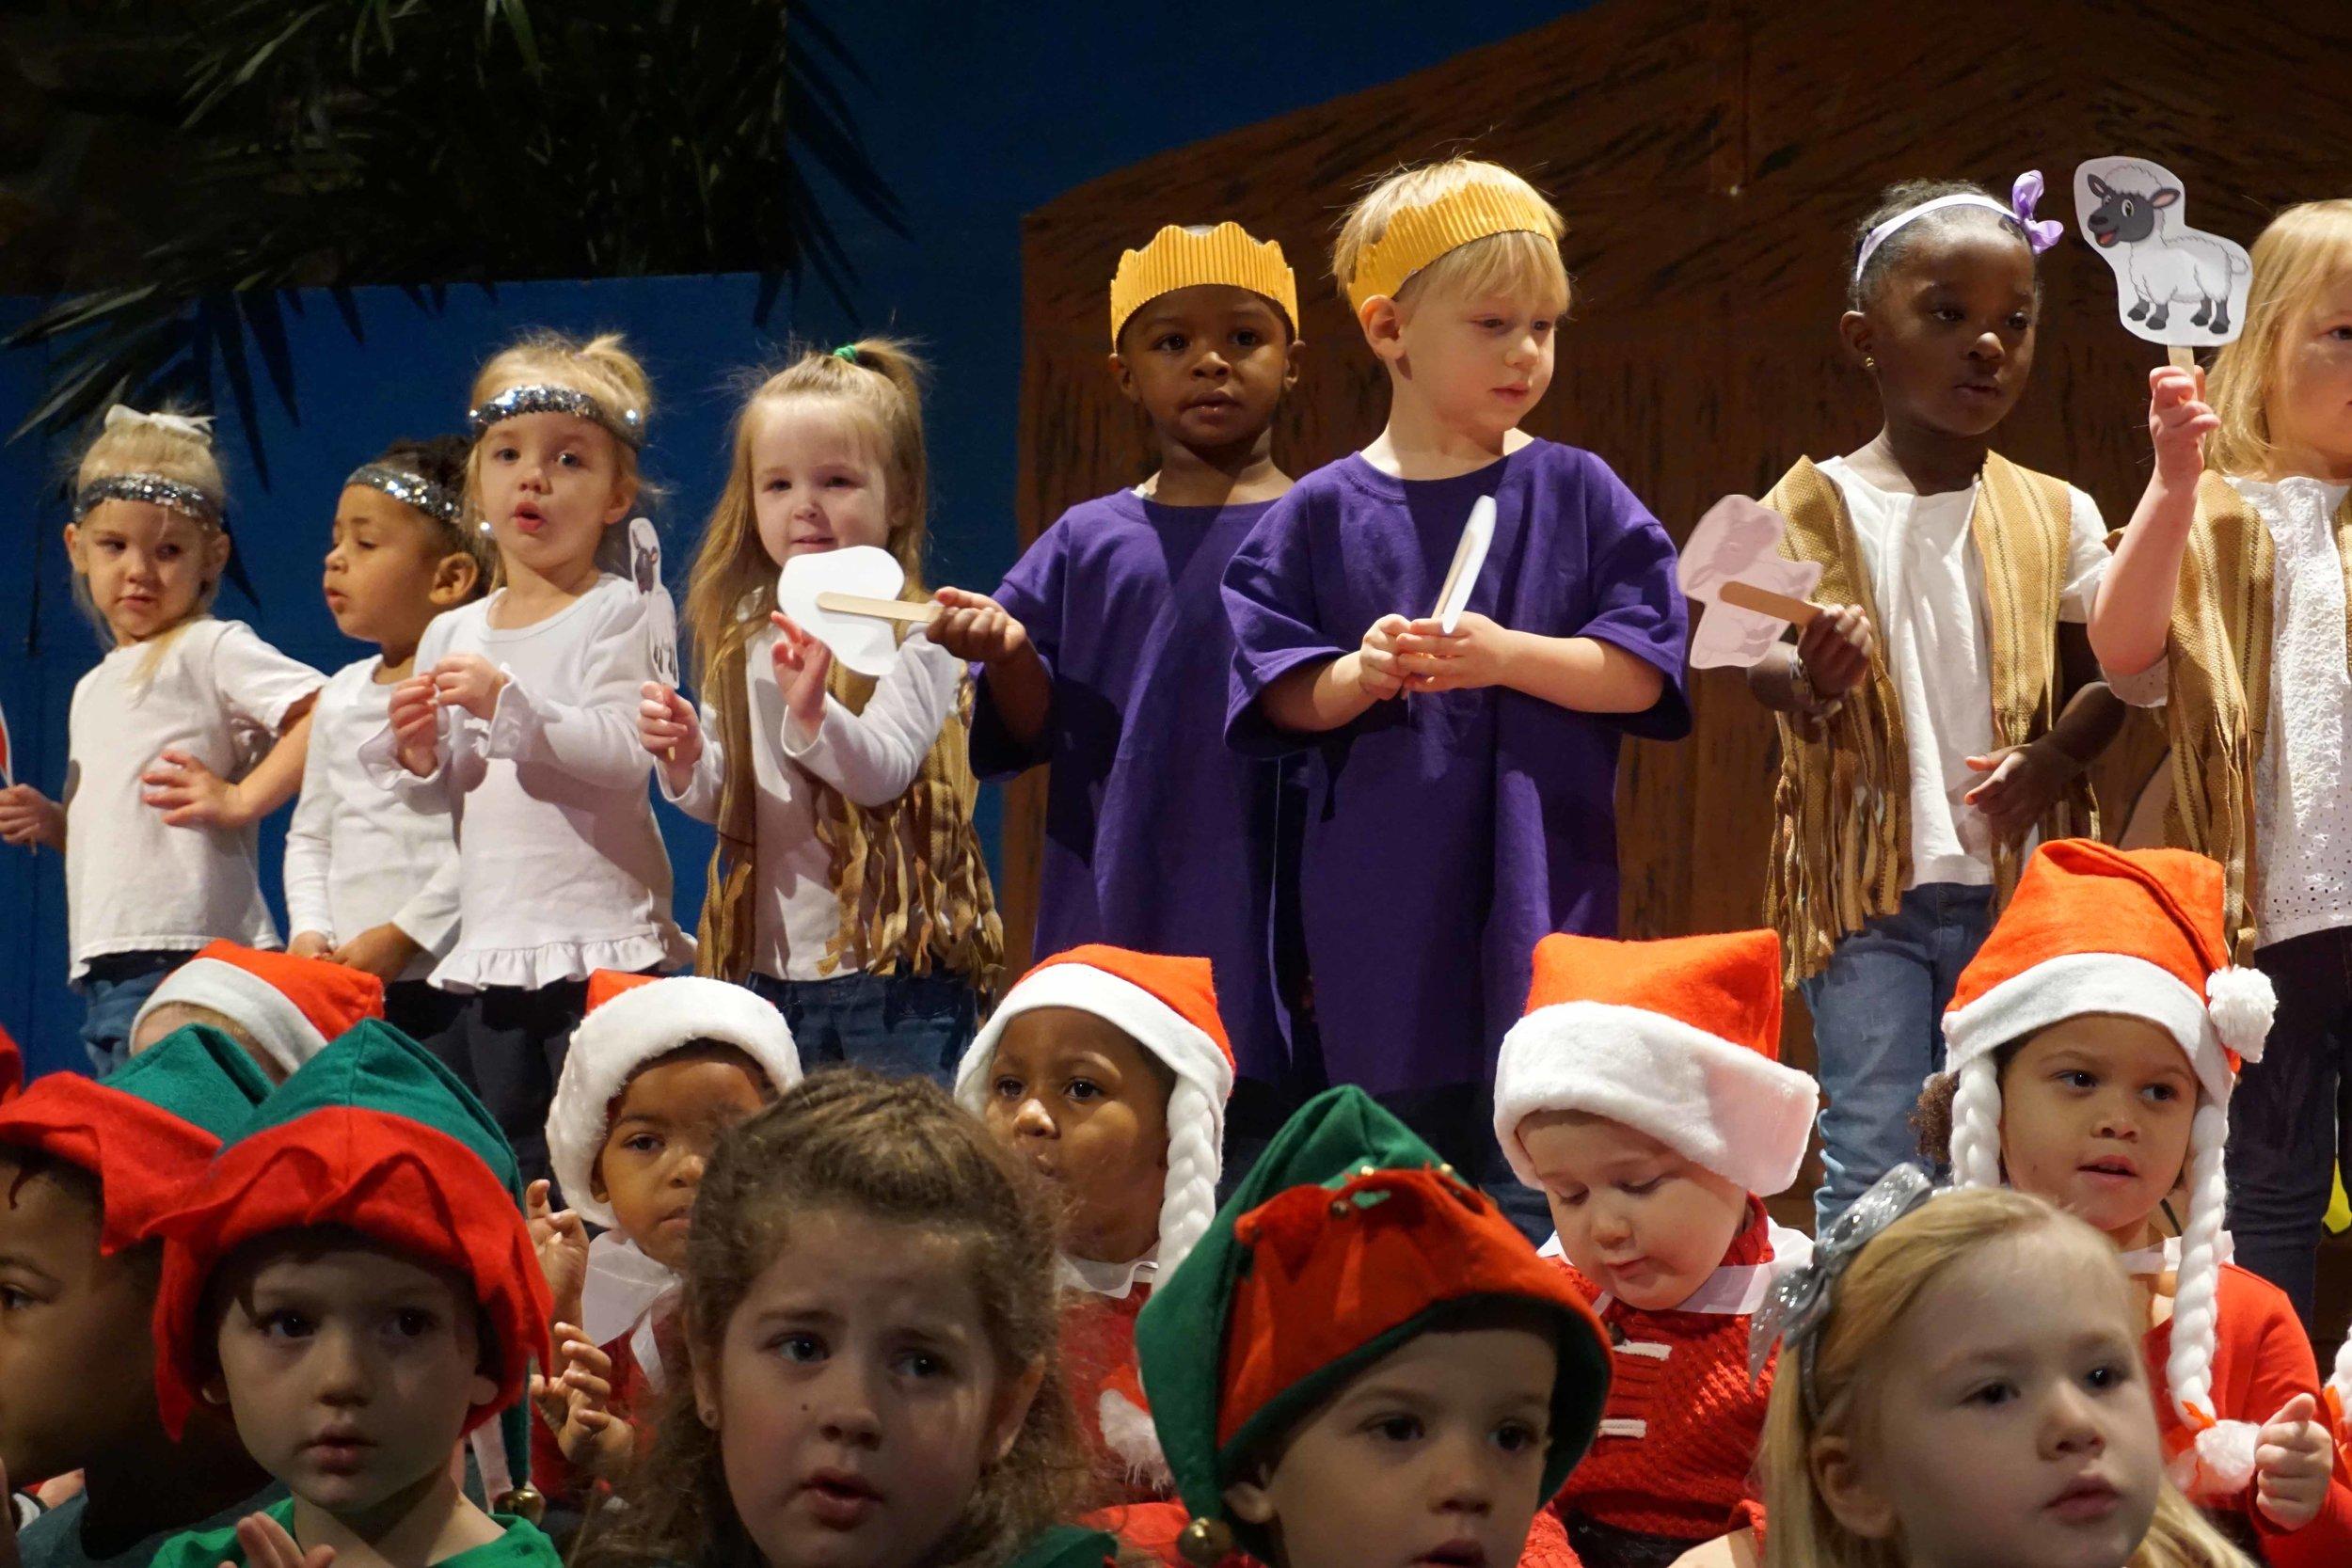 Dec13 WSLH ChristmasProgramTinyTravelers&HappyCamp52.jpg